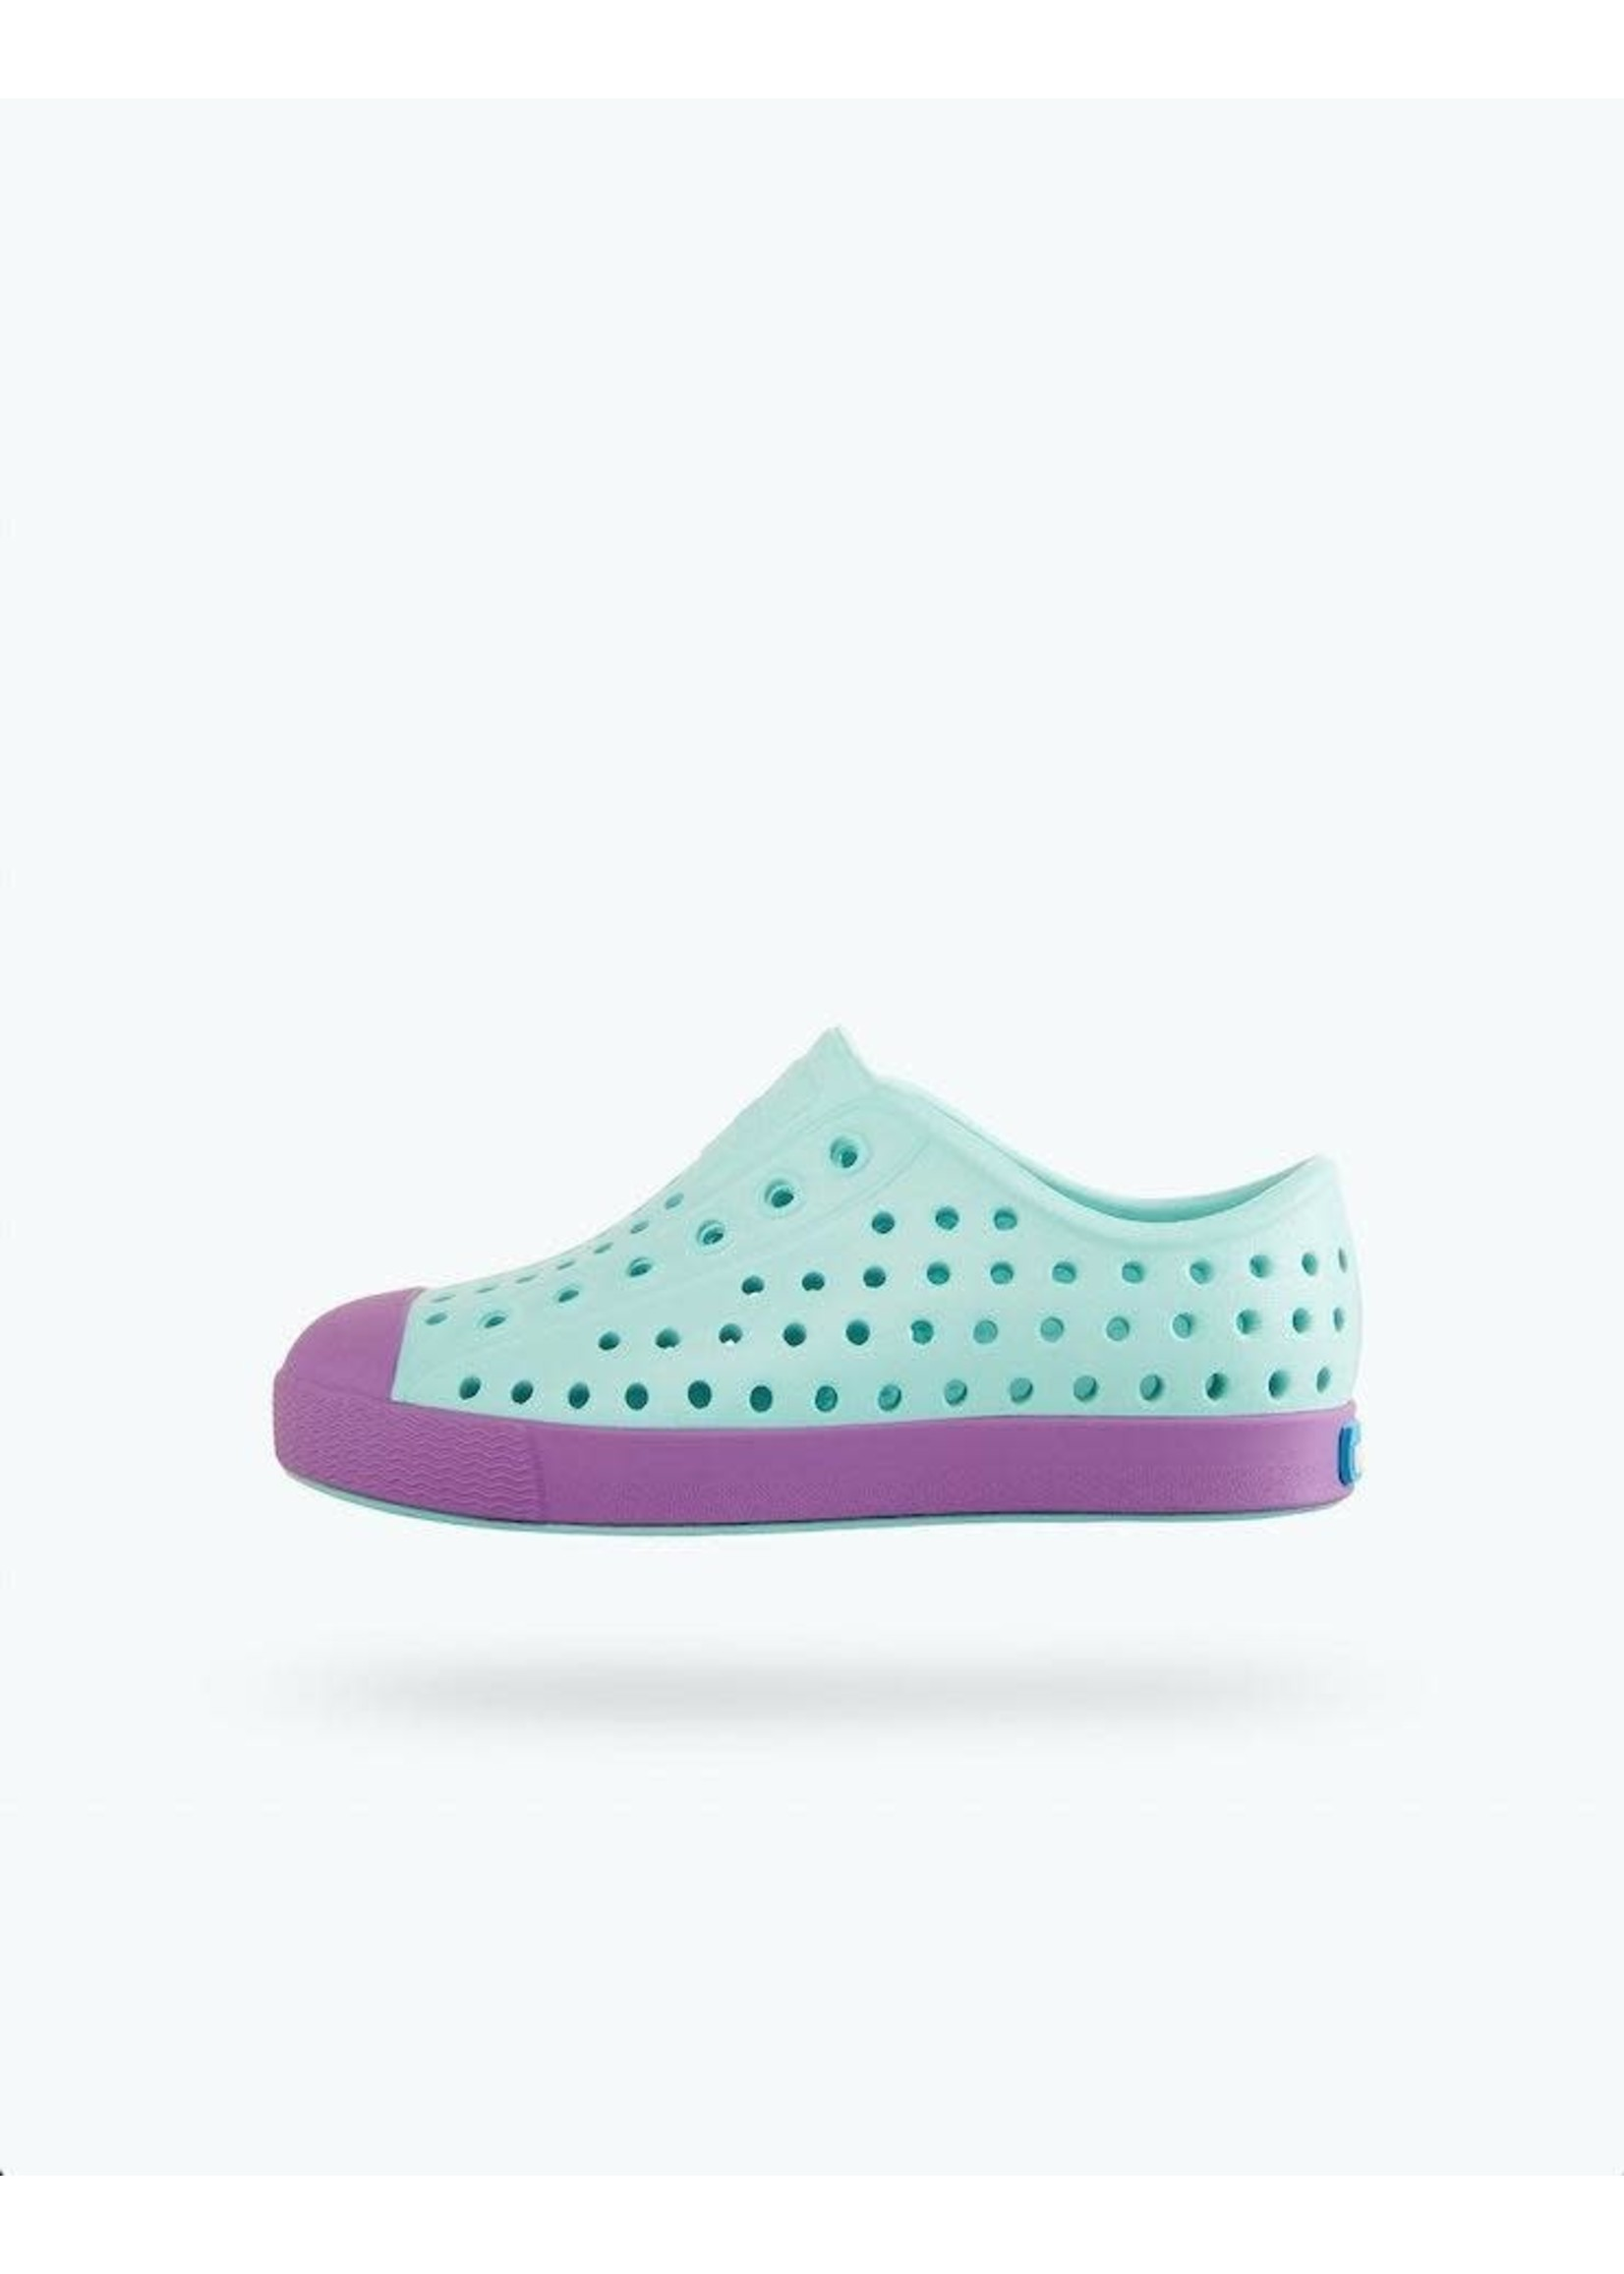 Native Shoes Native Shoes, Jefferson Child in Piedmont Blue/ Sea Fan Purple